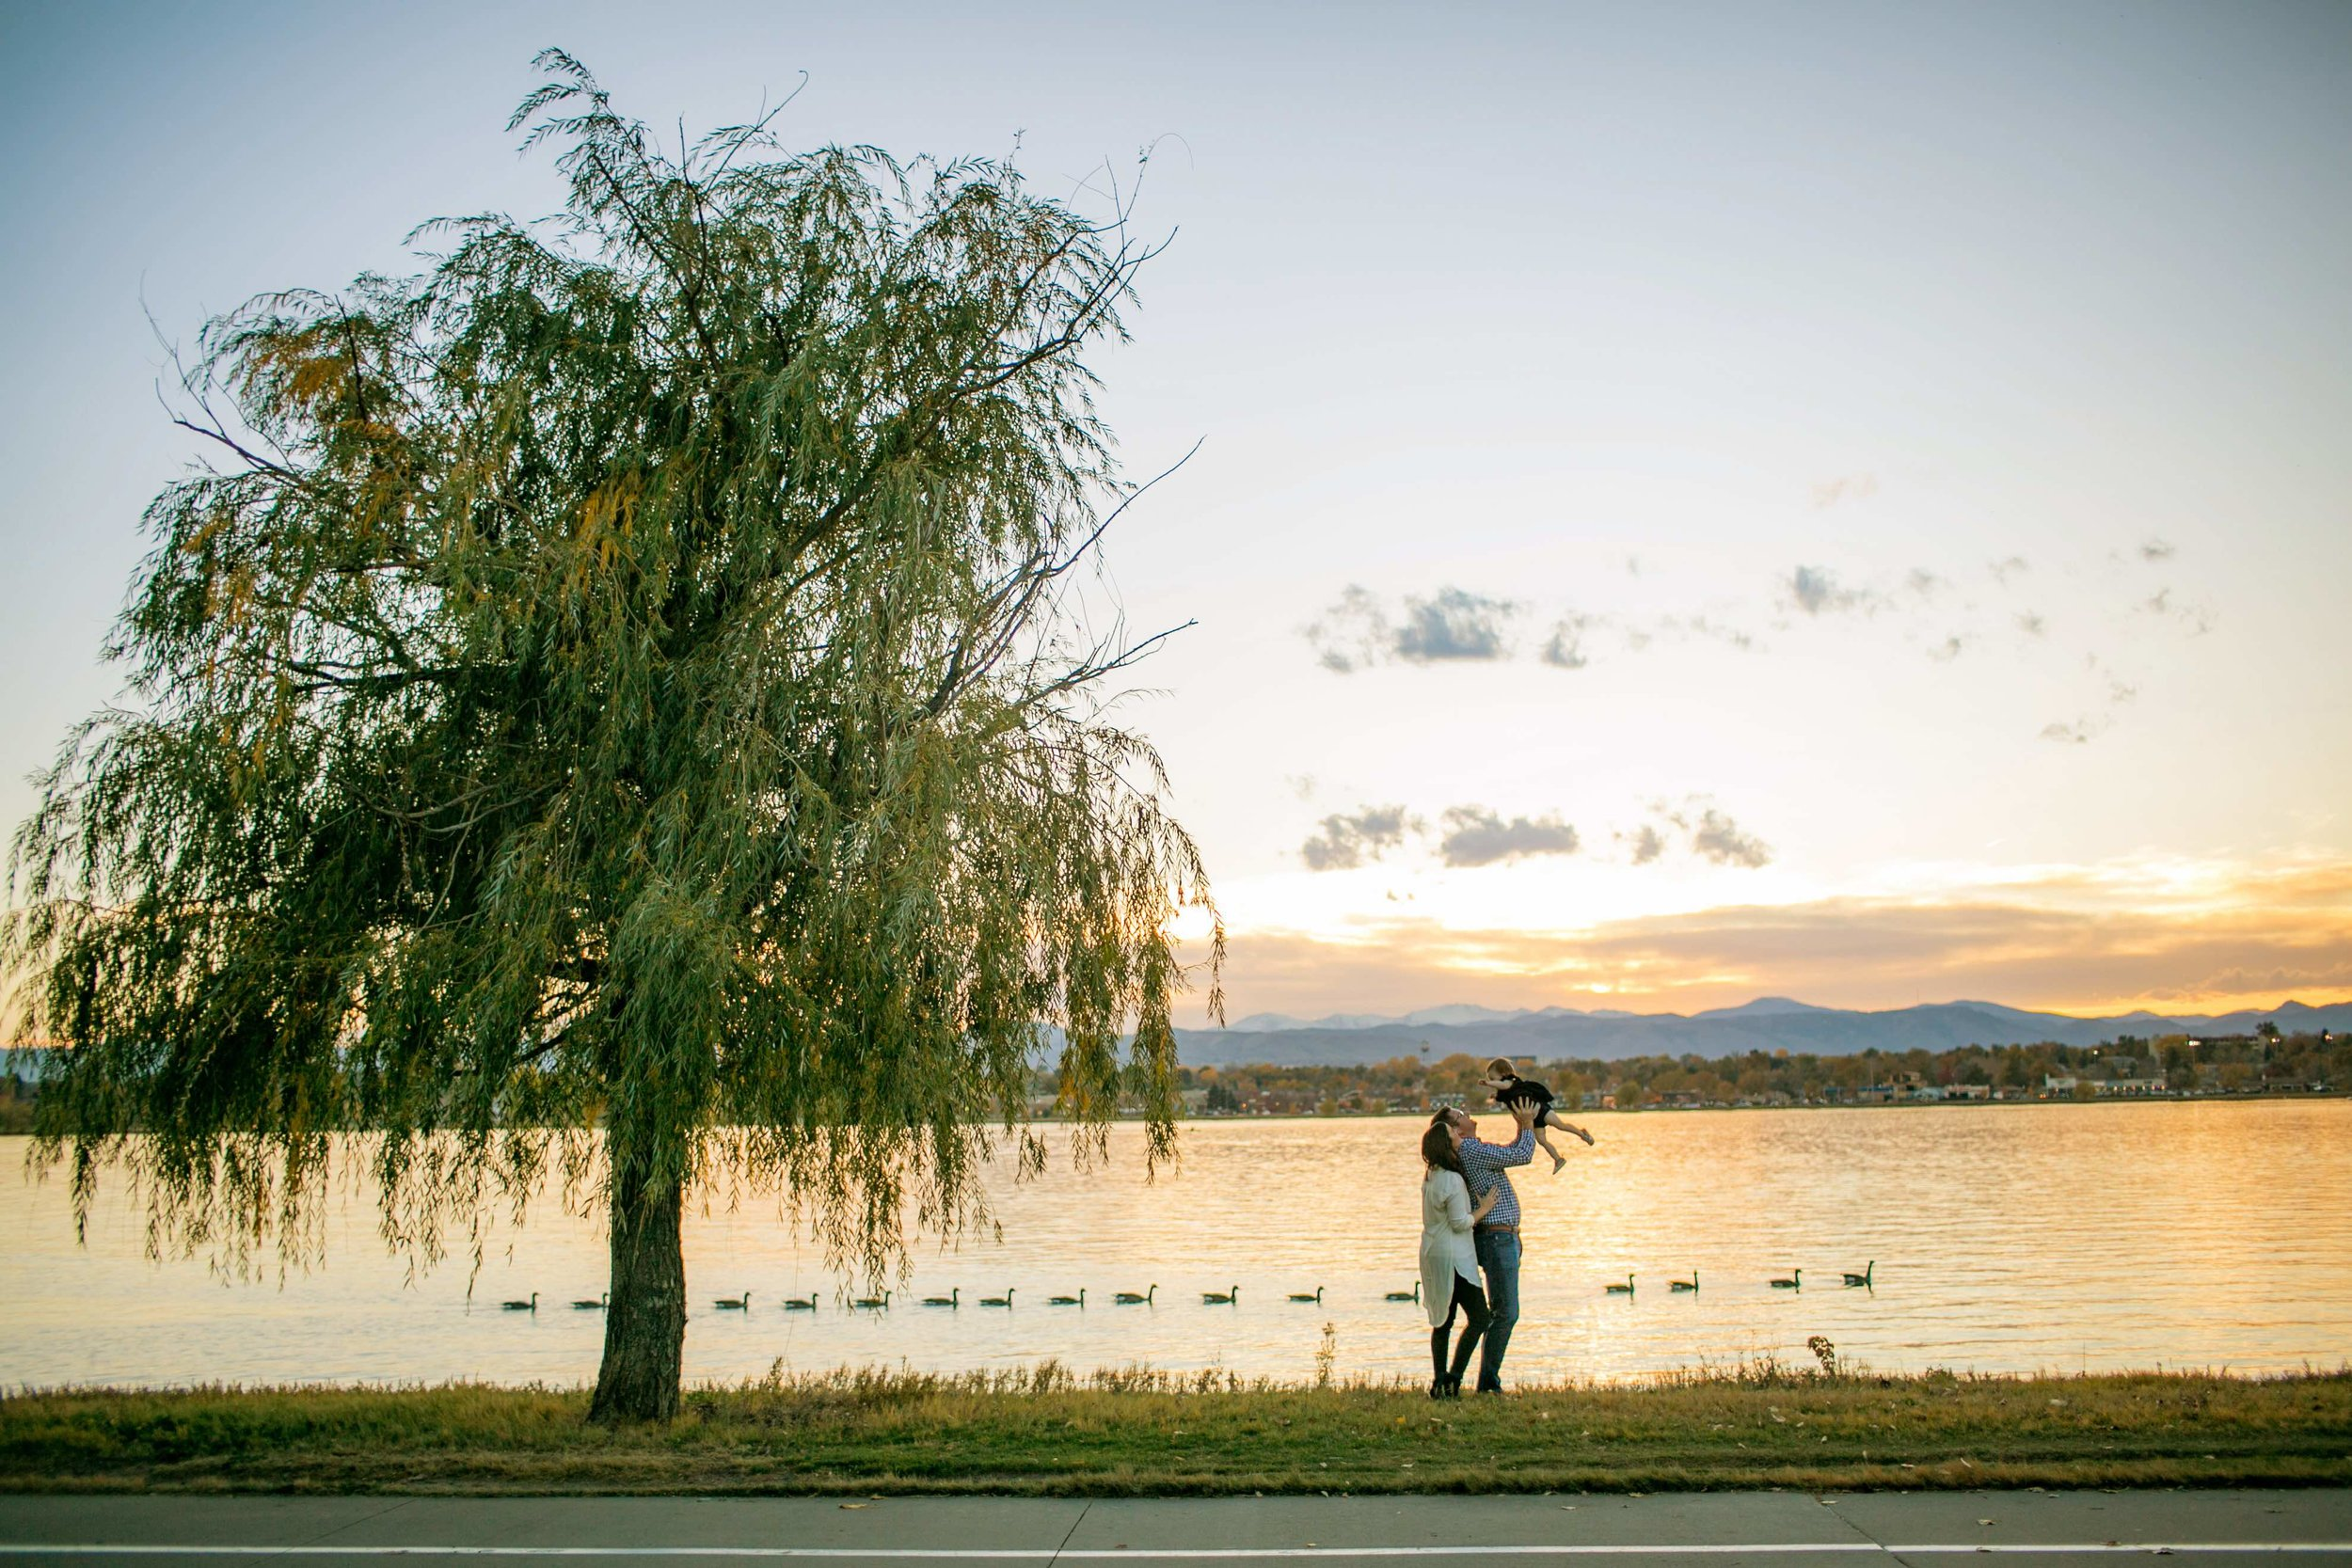 -colorado-wedding-photographer-denver-springs-vail-20171020-607A8919.jpeg